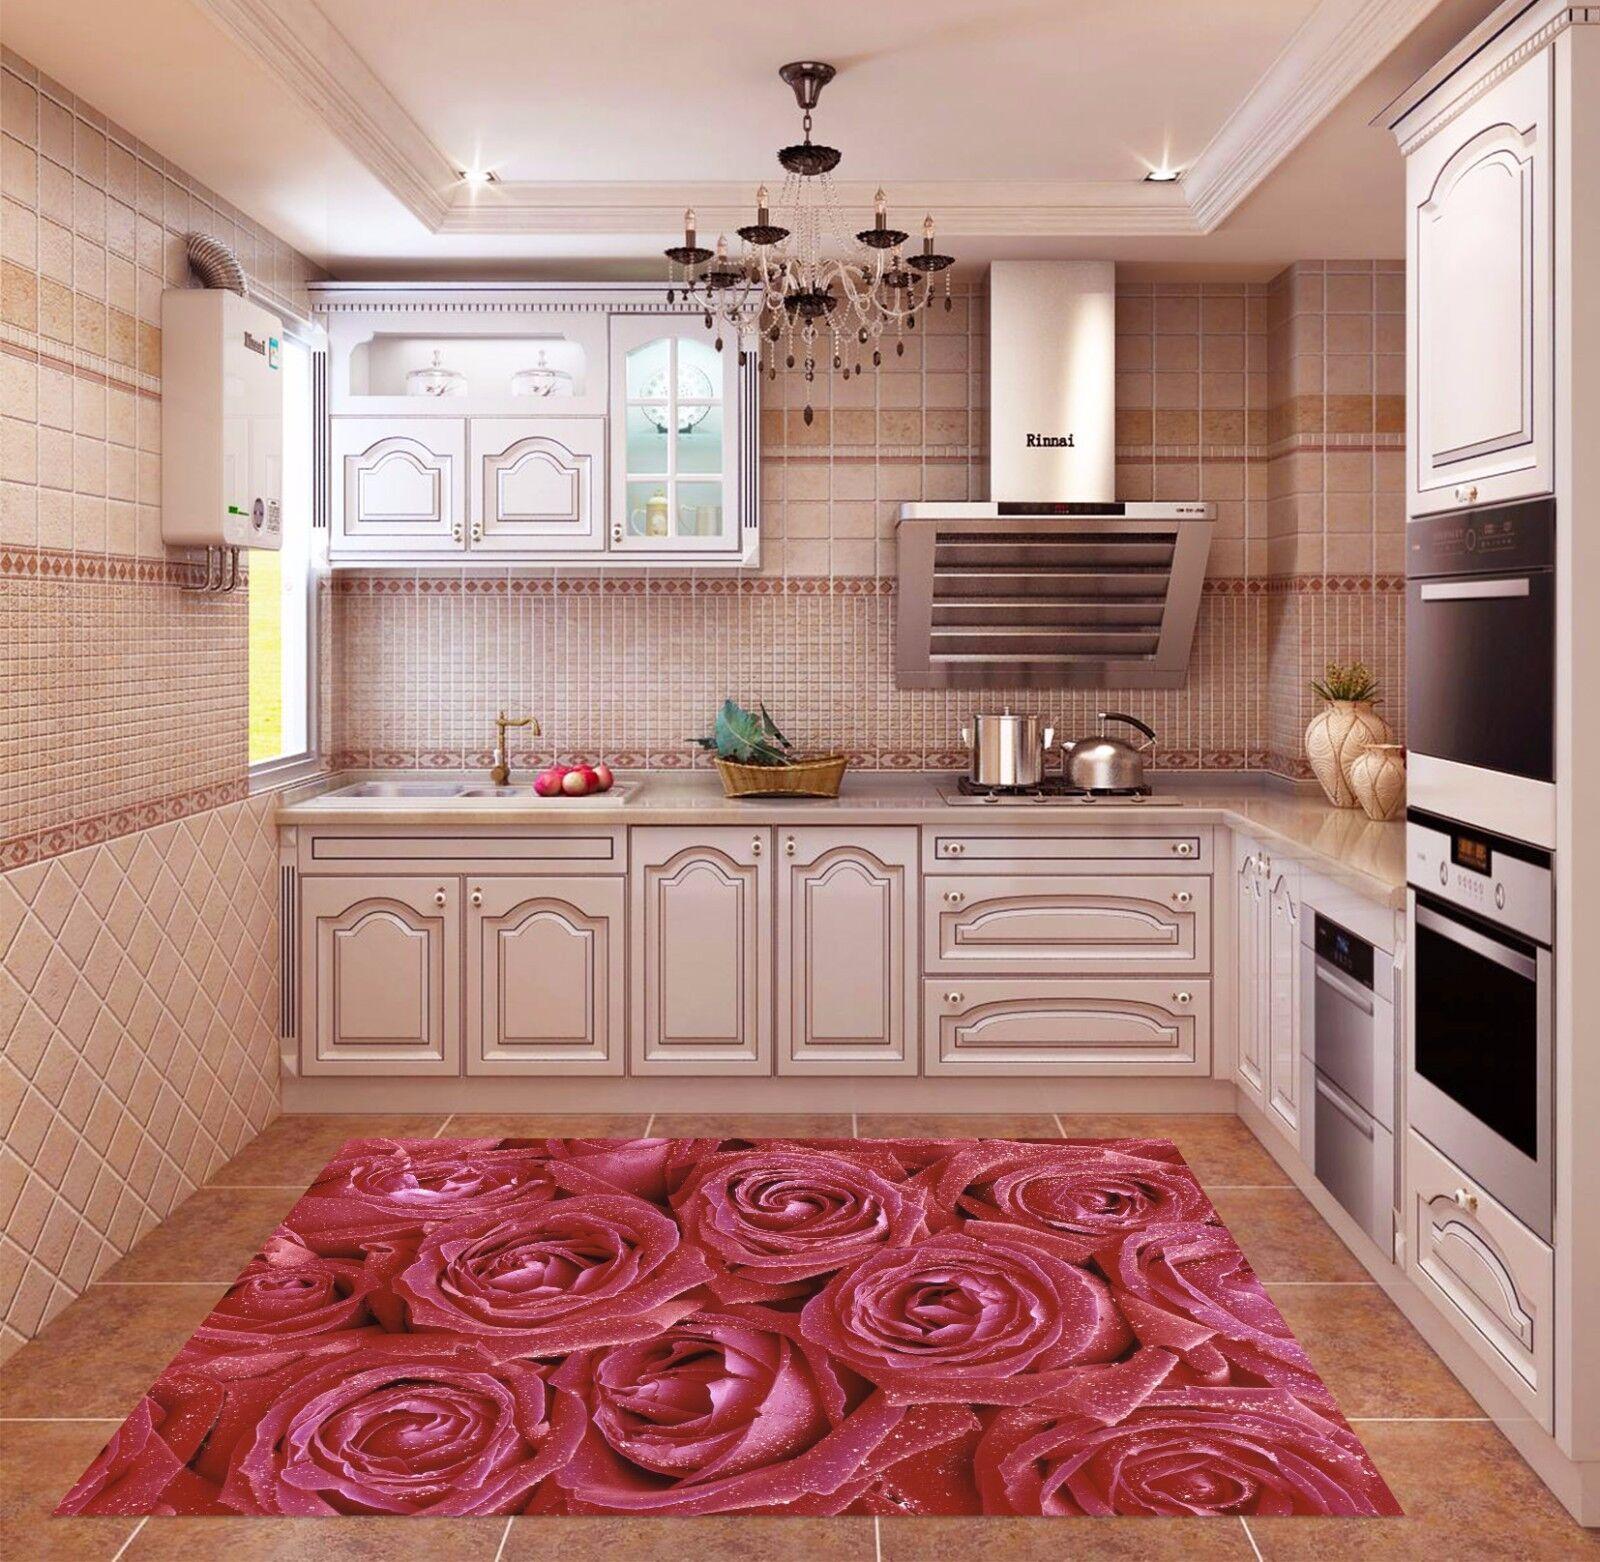 3D Flowers Dews 5 Kitchen Mat Floor Murals Wall Print Wall Deco AJ WALLPAPER AU